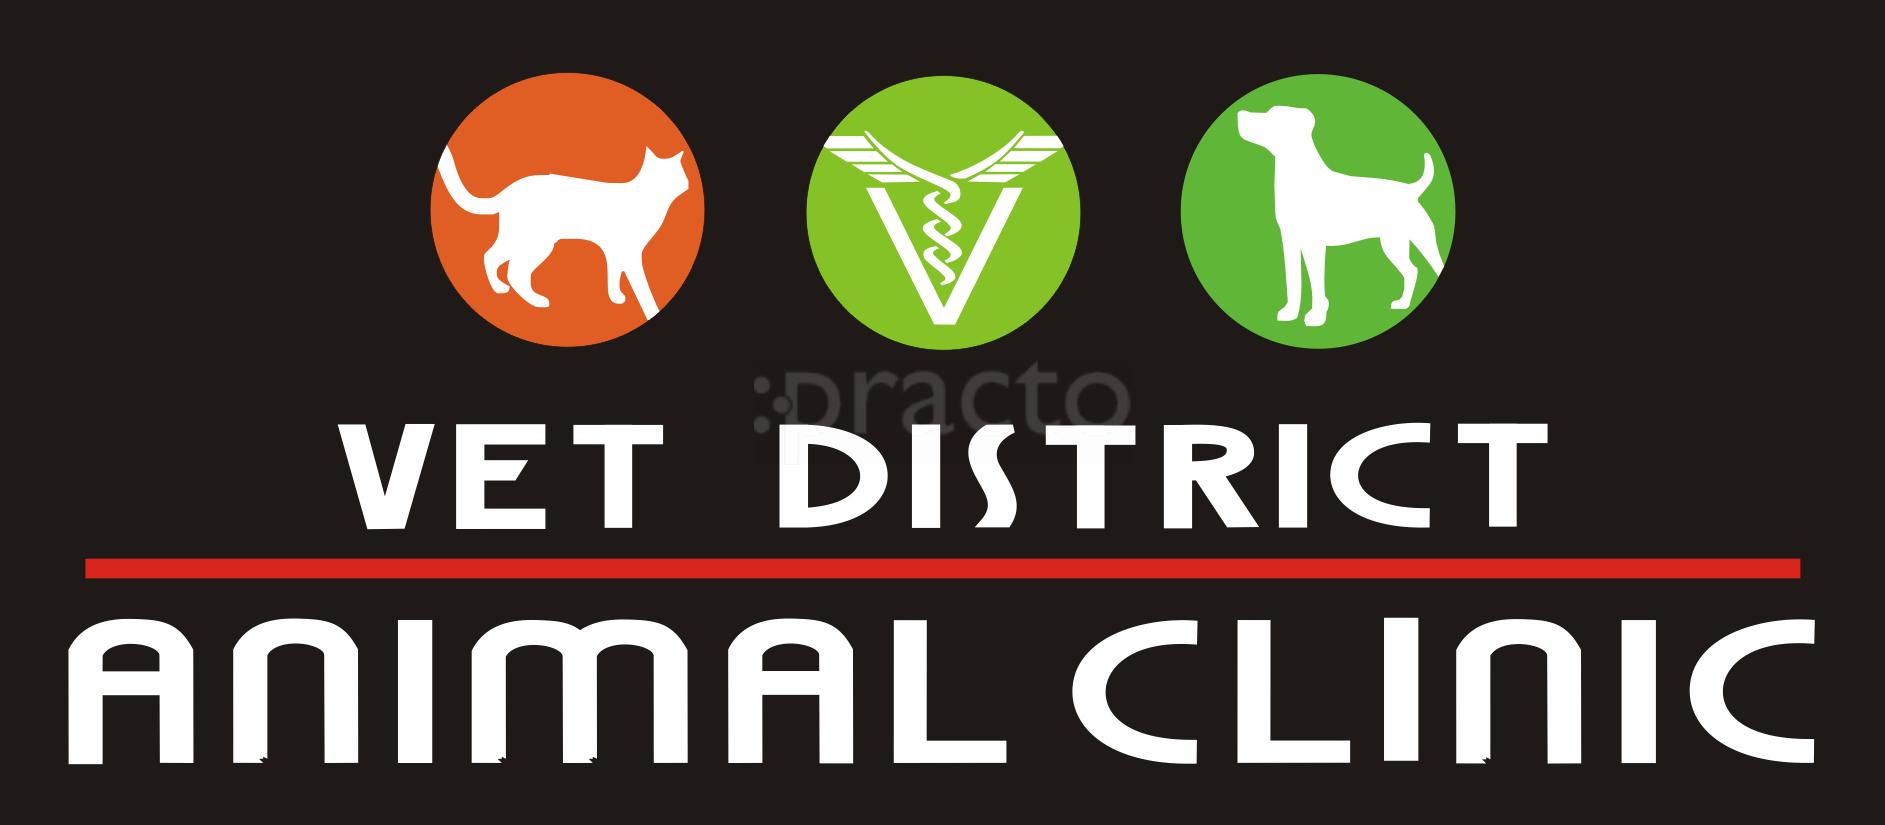 Vet District Animal Clinic